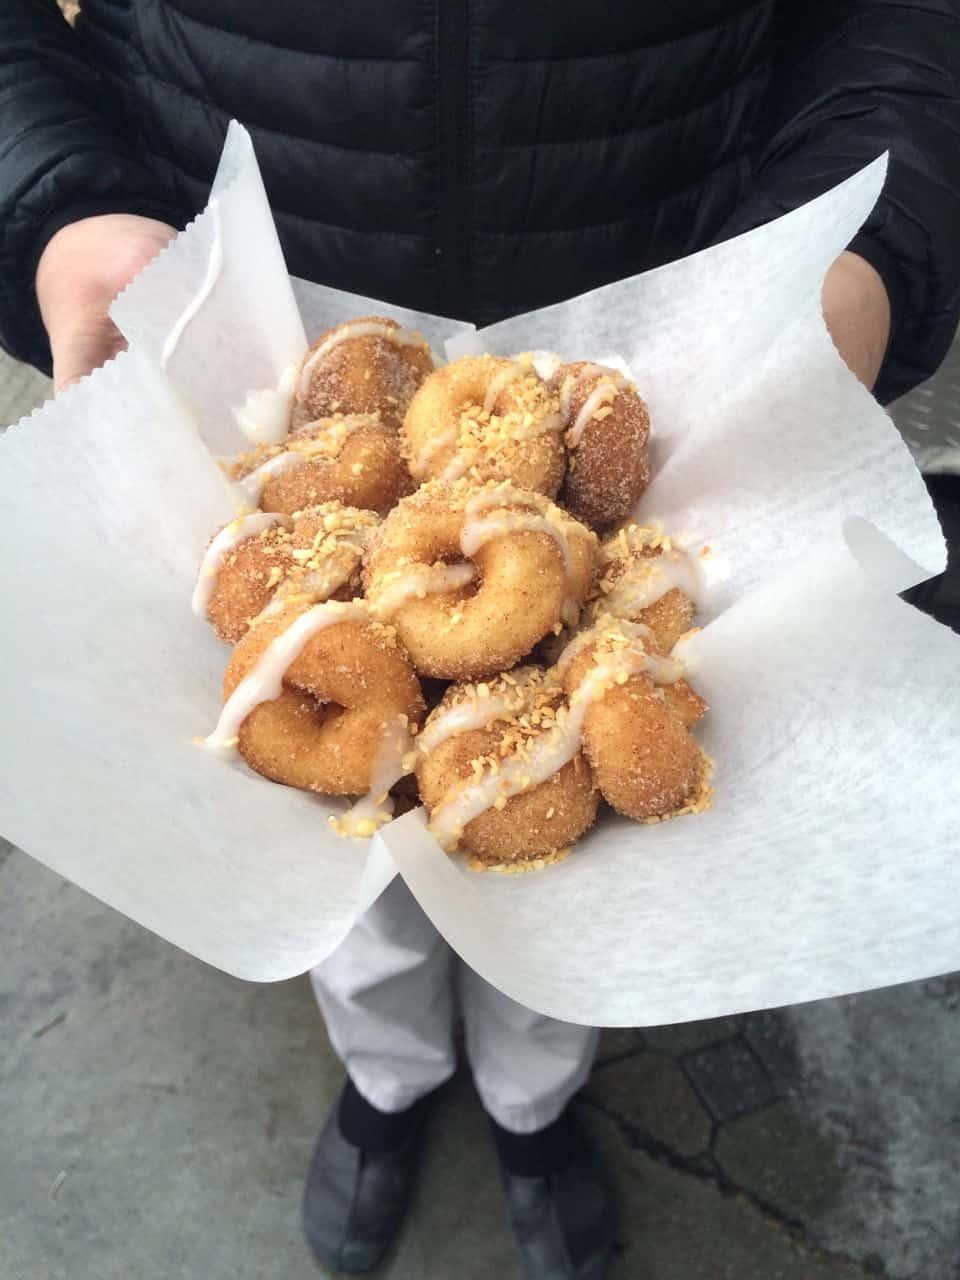 Female Foodie SLC: Art City Donuts